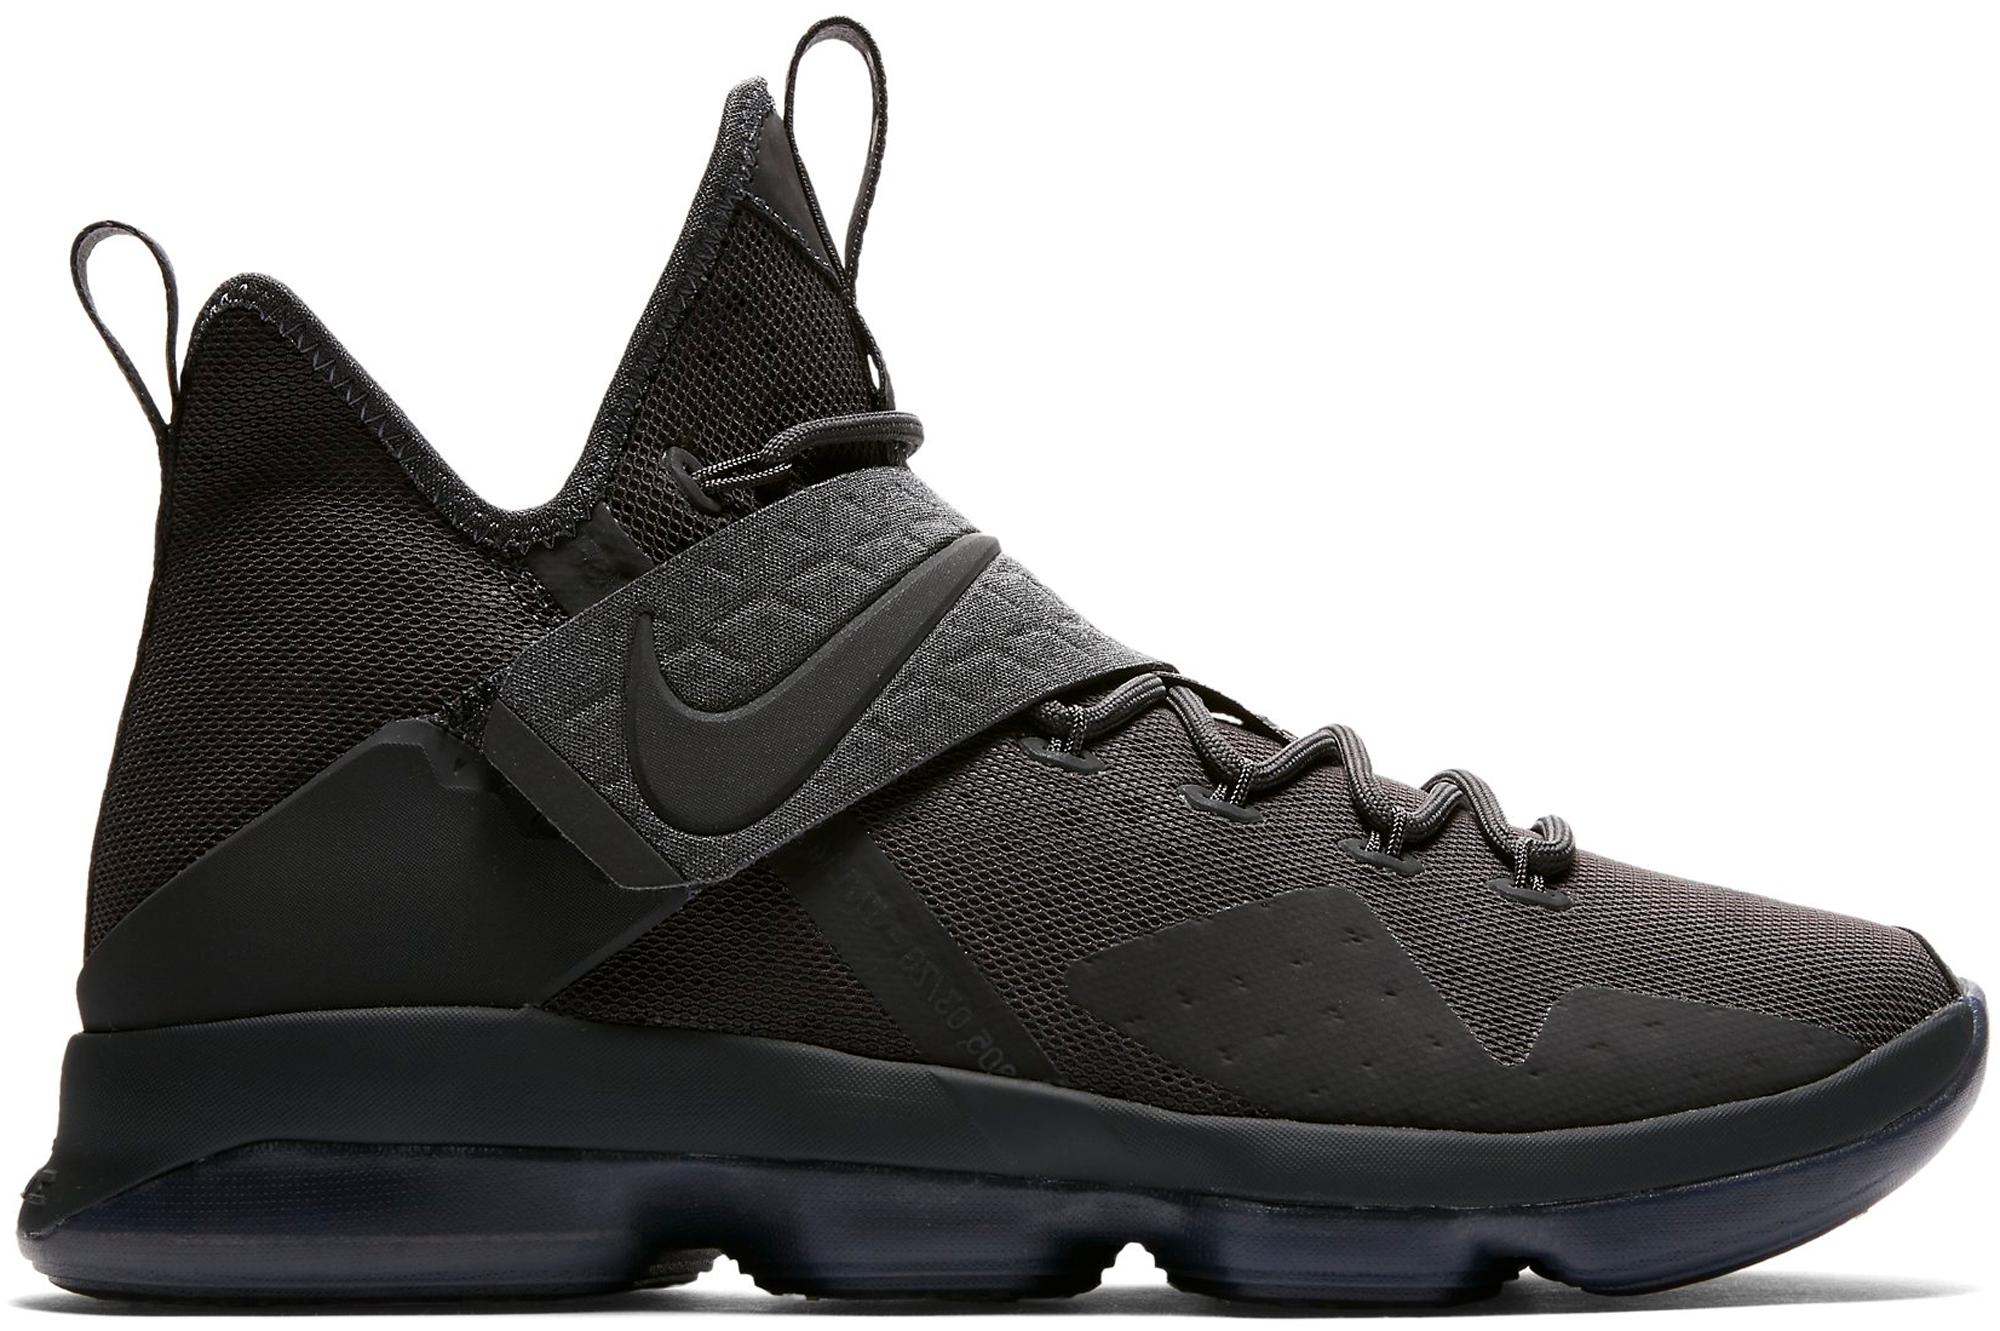 Nike LeBron 14 Anthracite - StockX News